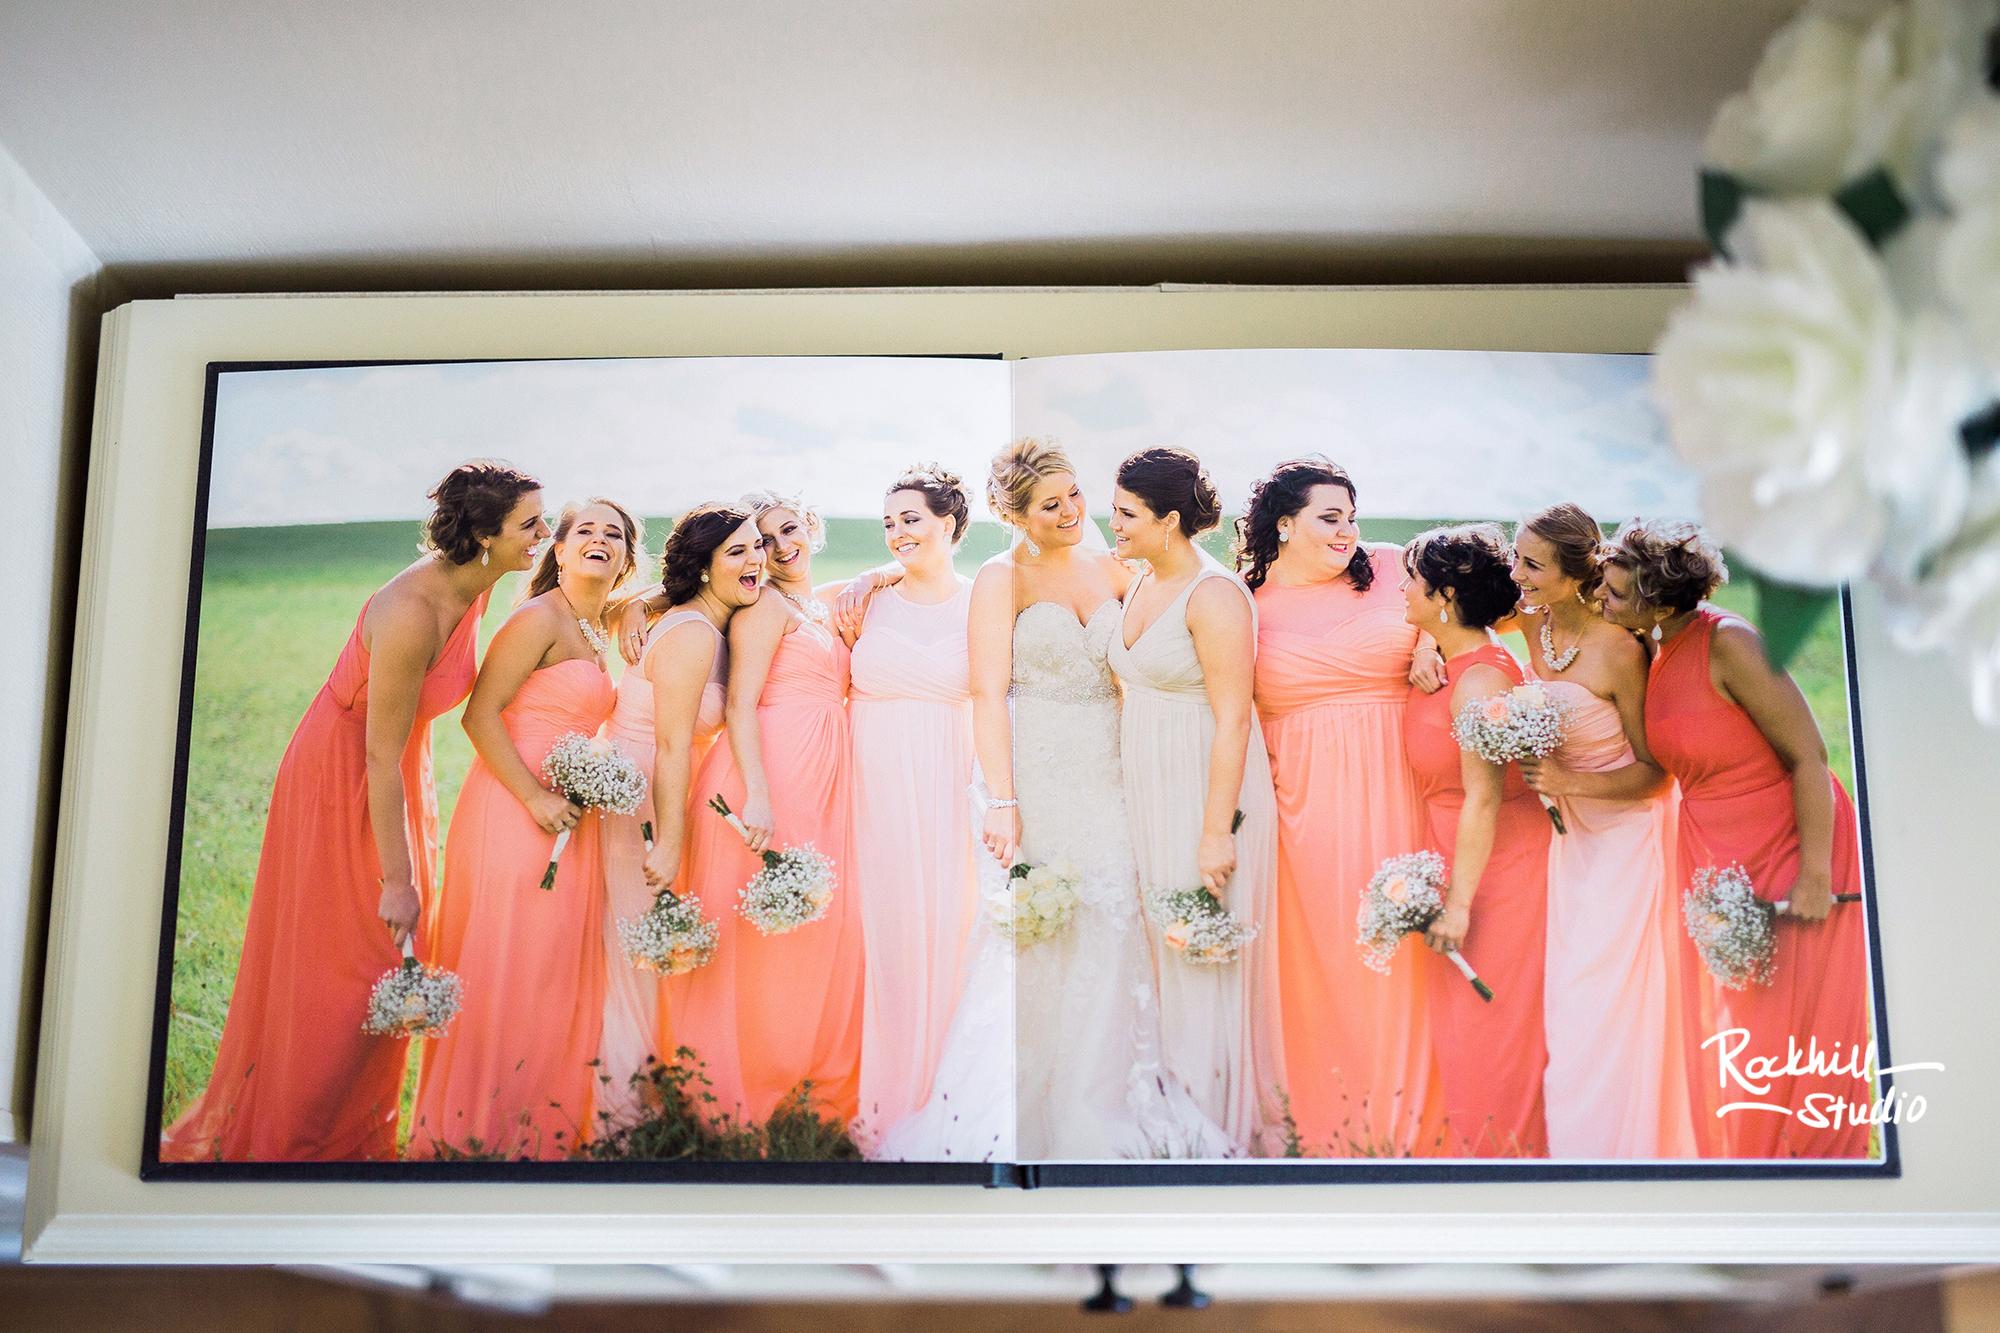 rockhill-wedding-photography-album-michigan-2.jpg